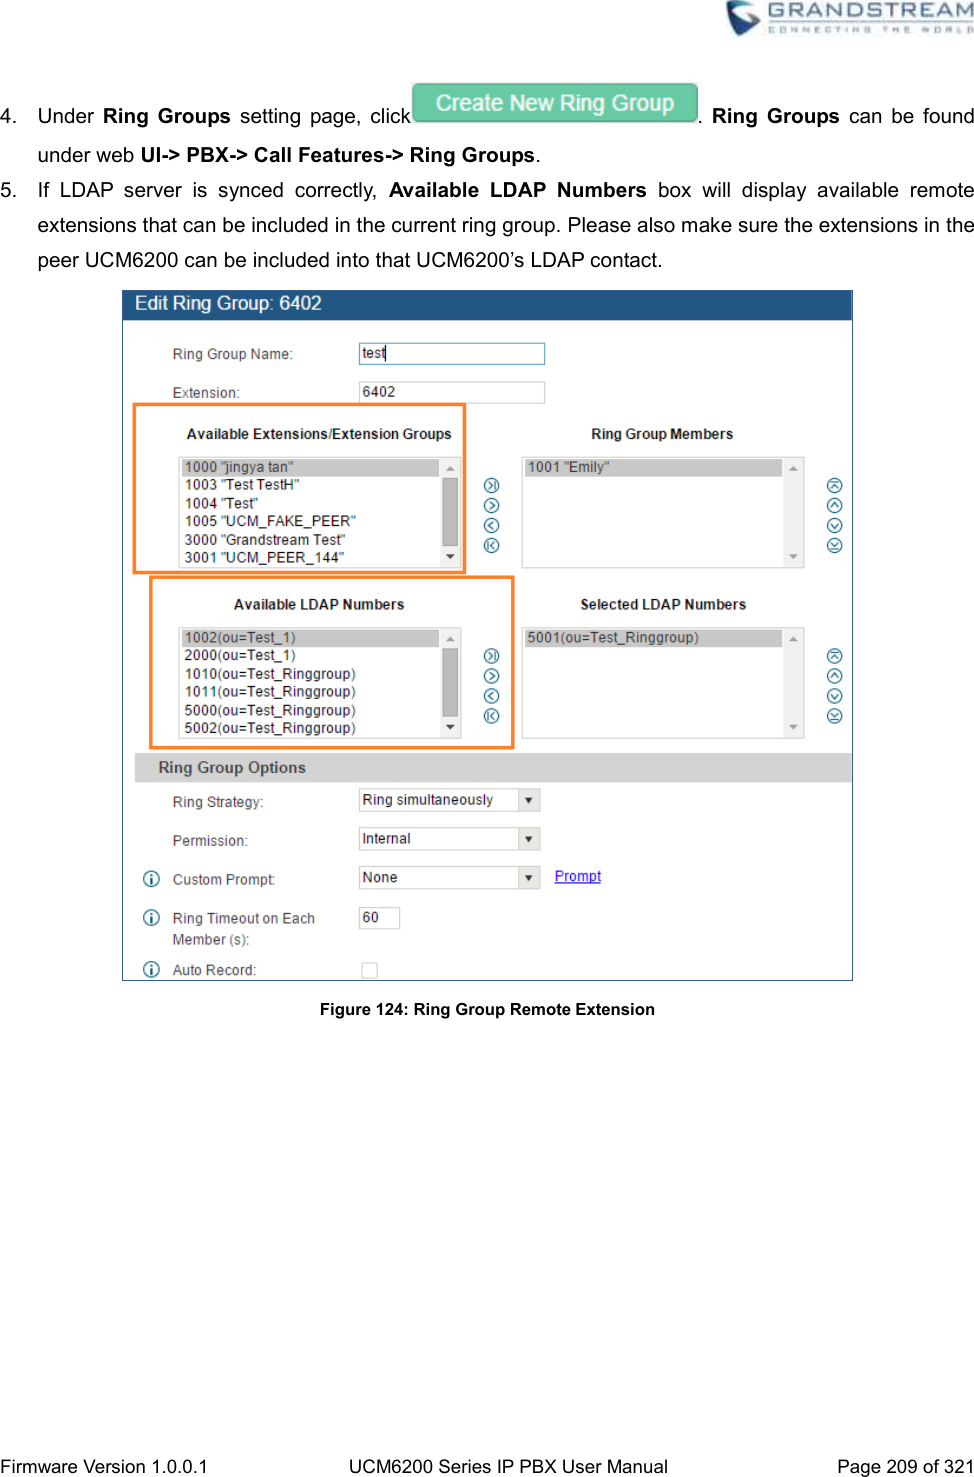 Grandstream Networks UCM6202 IP PBX User Manual